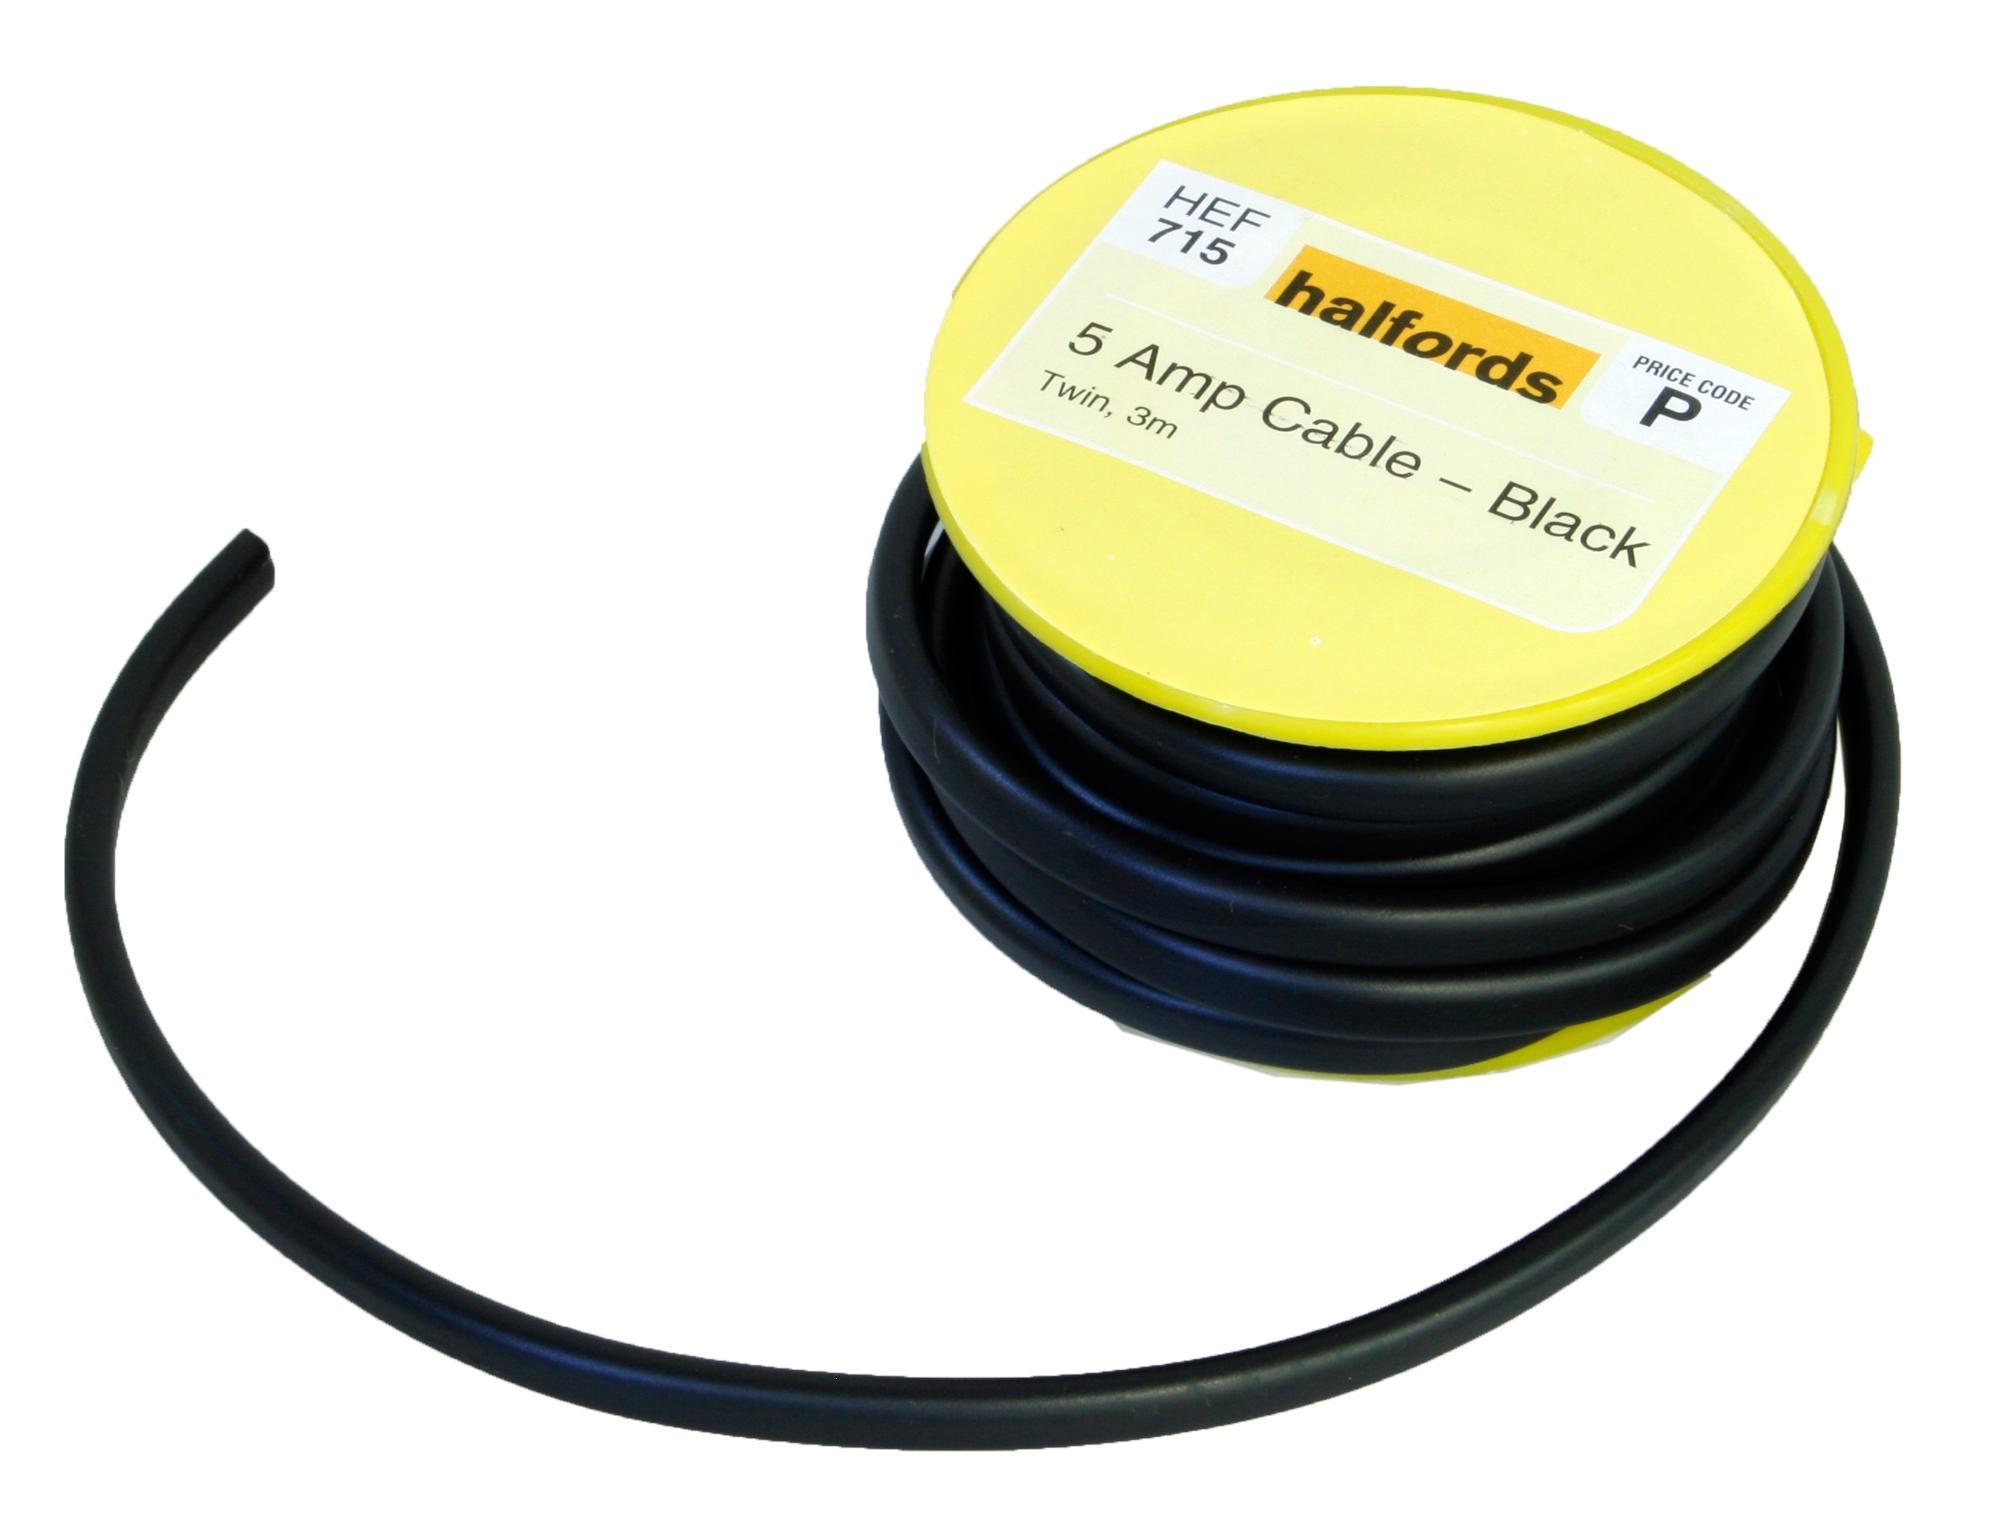 halfords 5 amp twin cable black hef rh halfords com